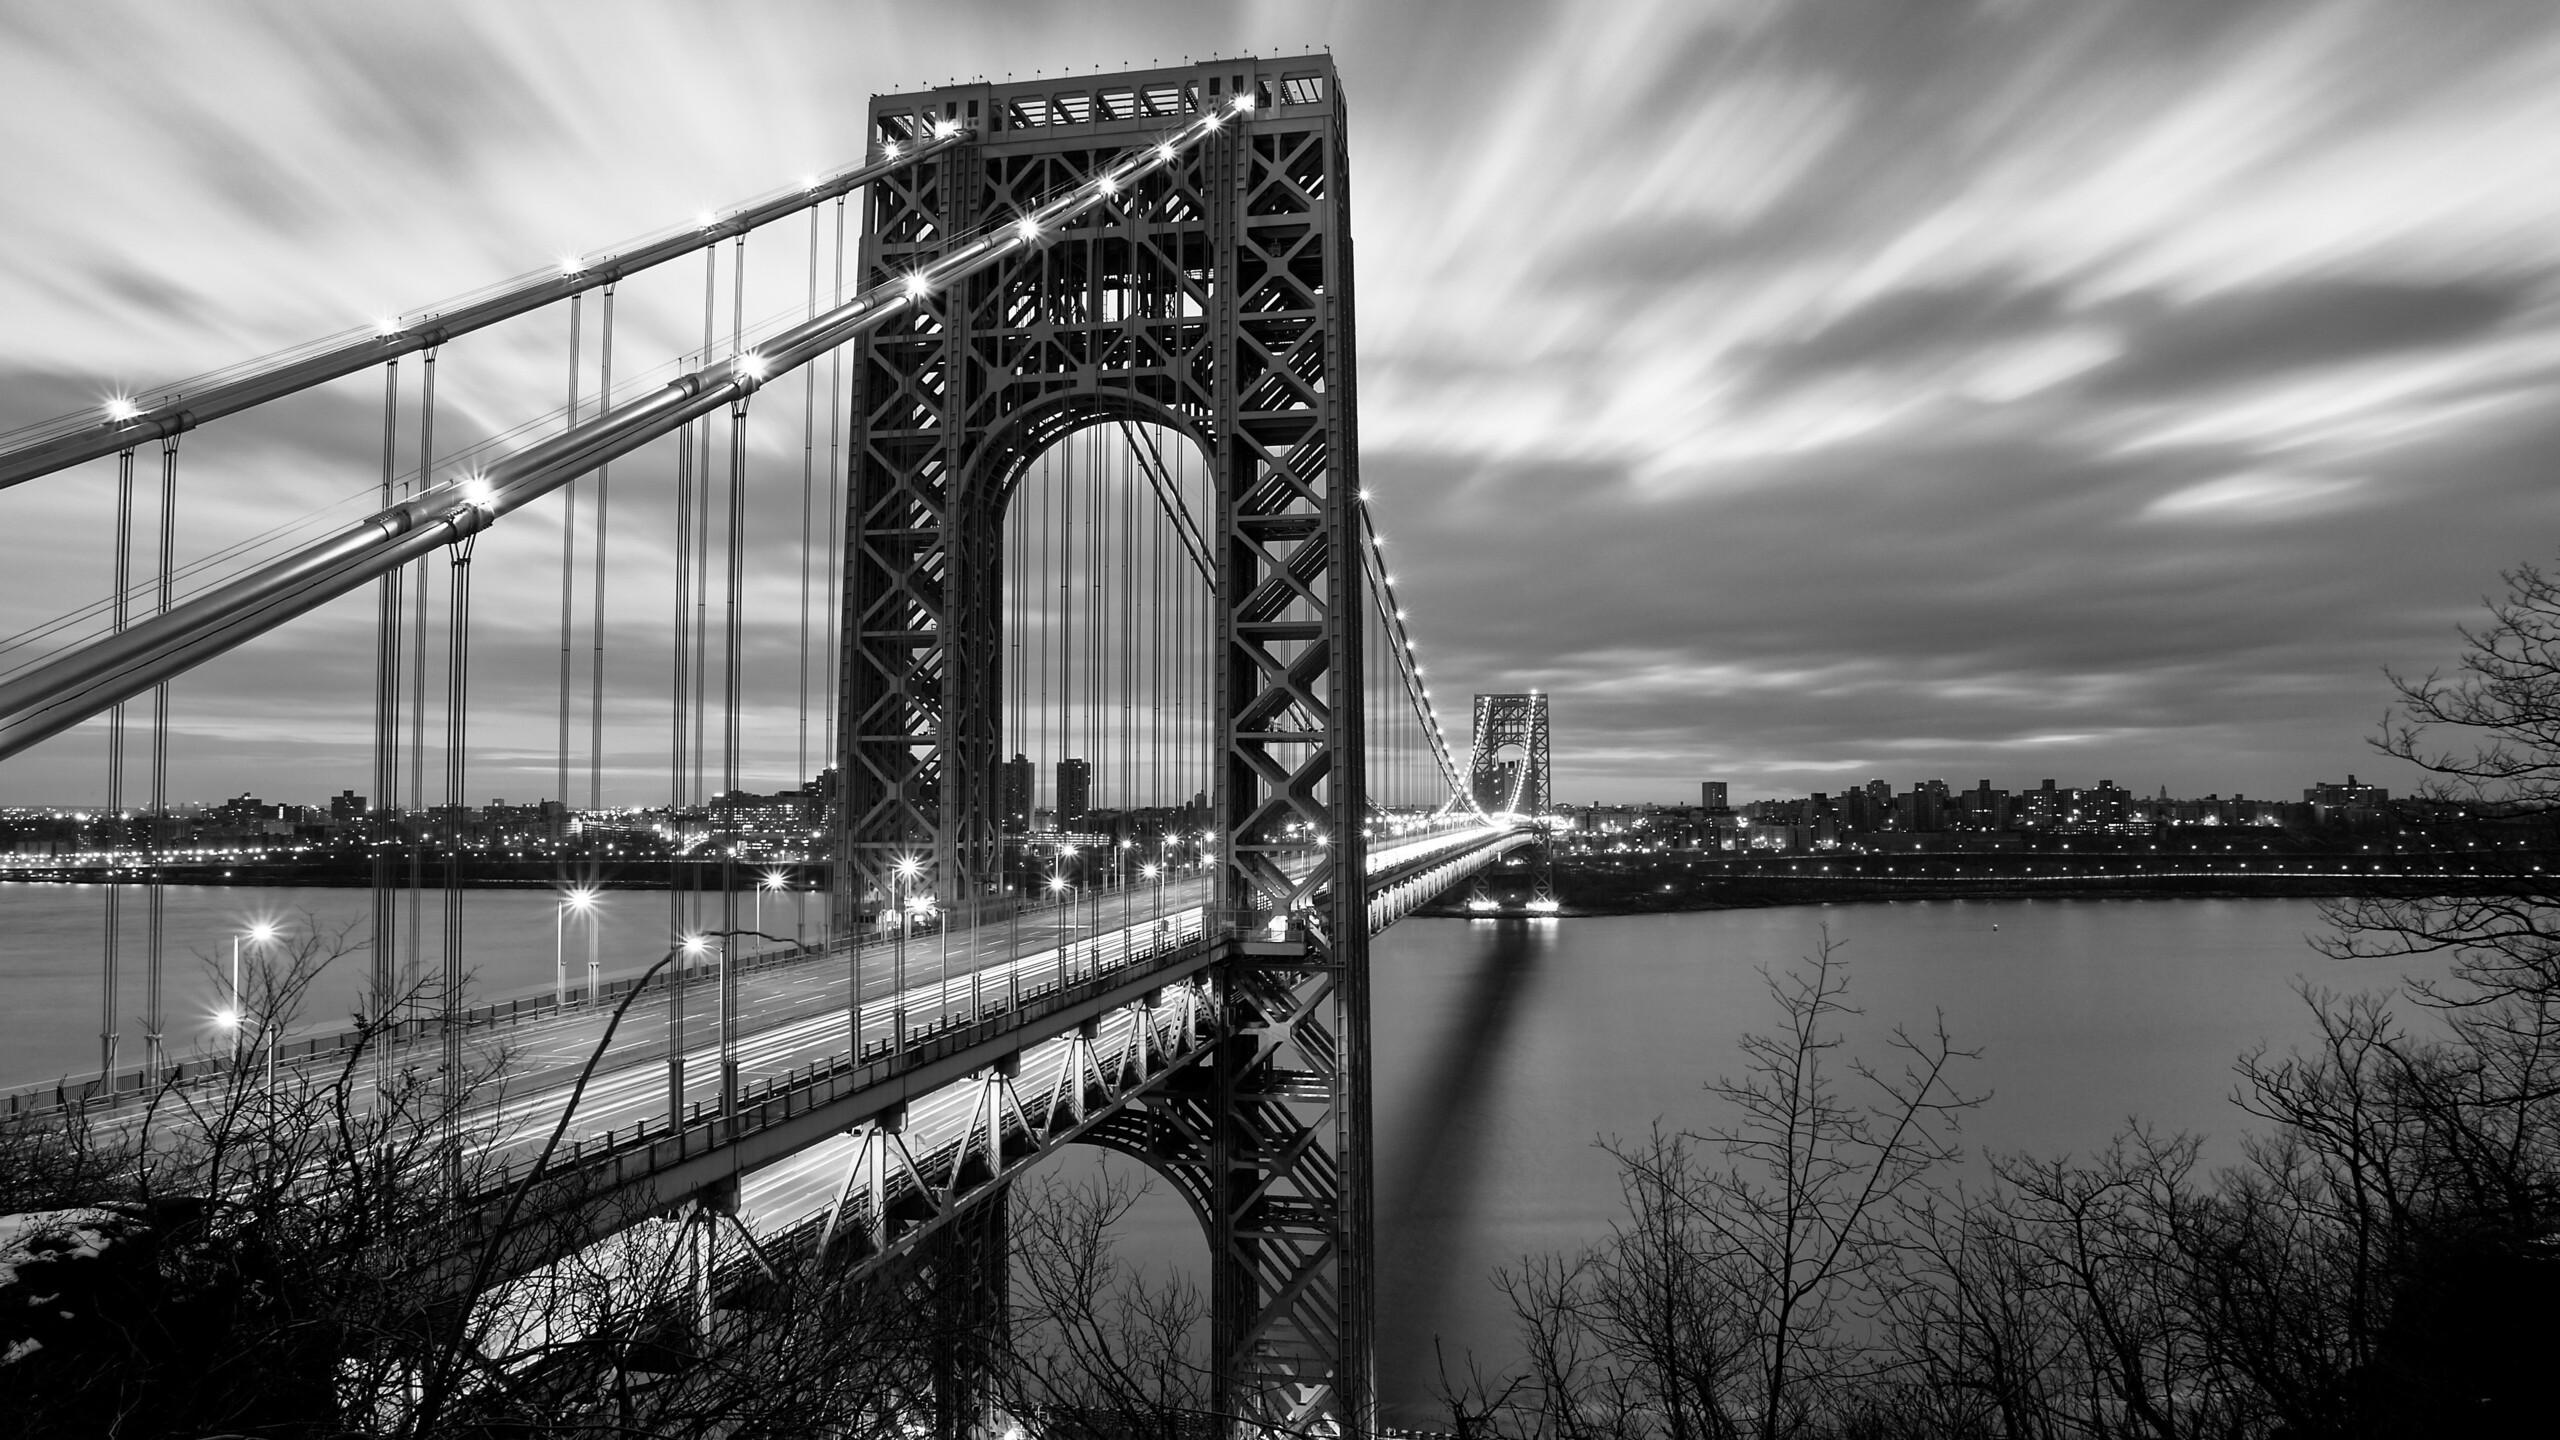 bridge-black-and-white.jpg